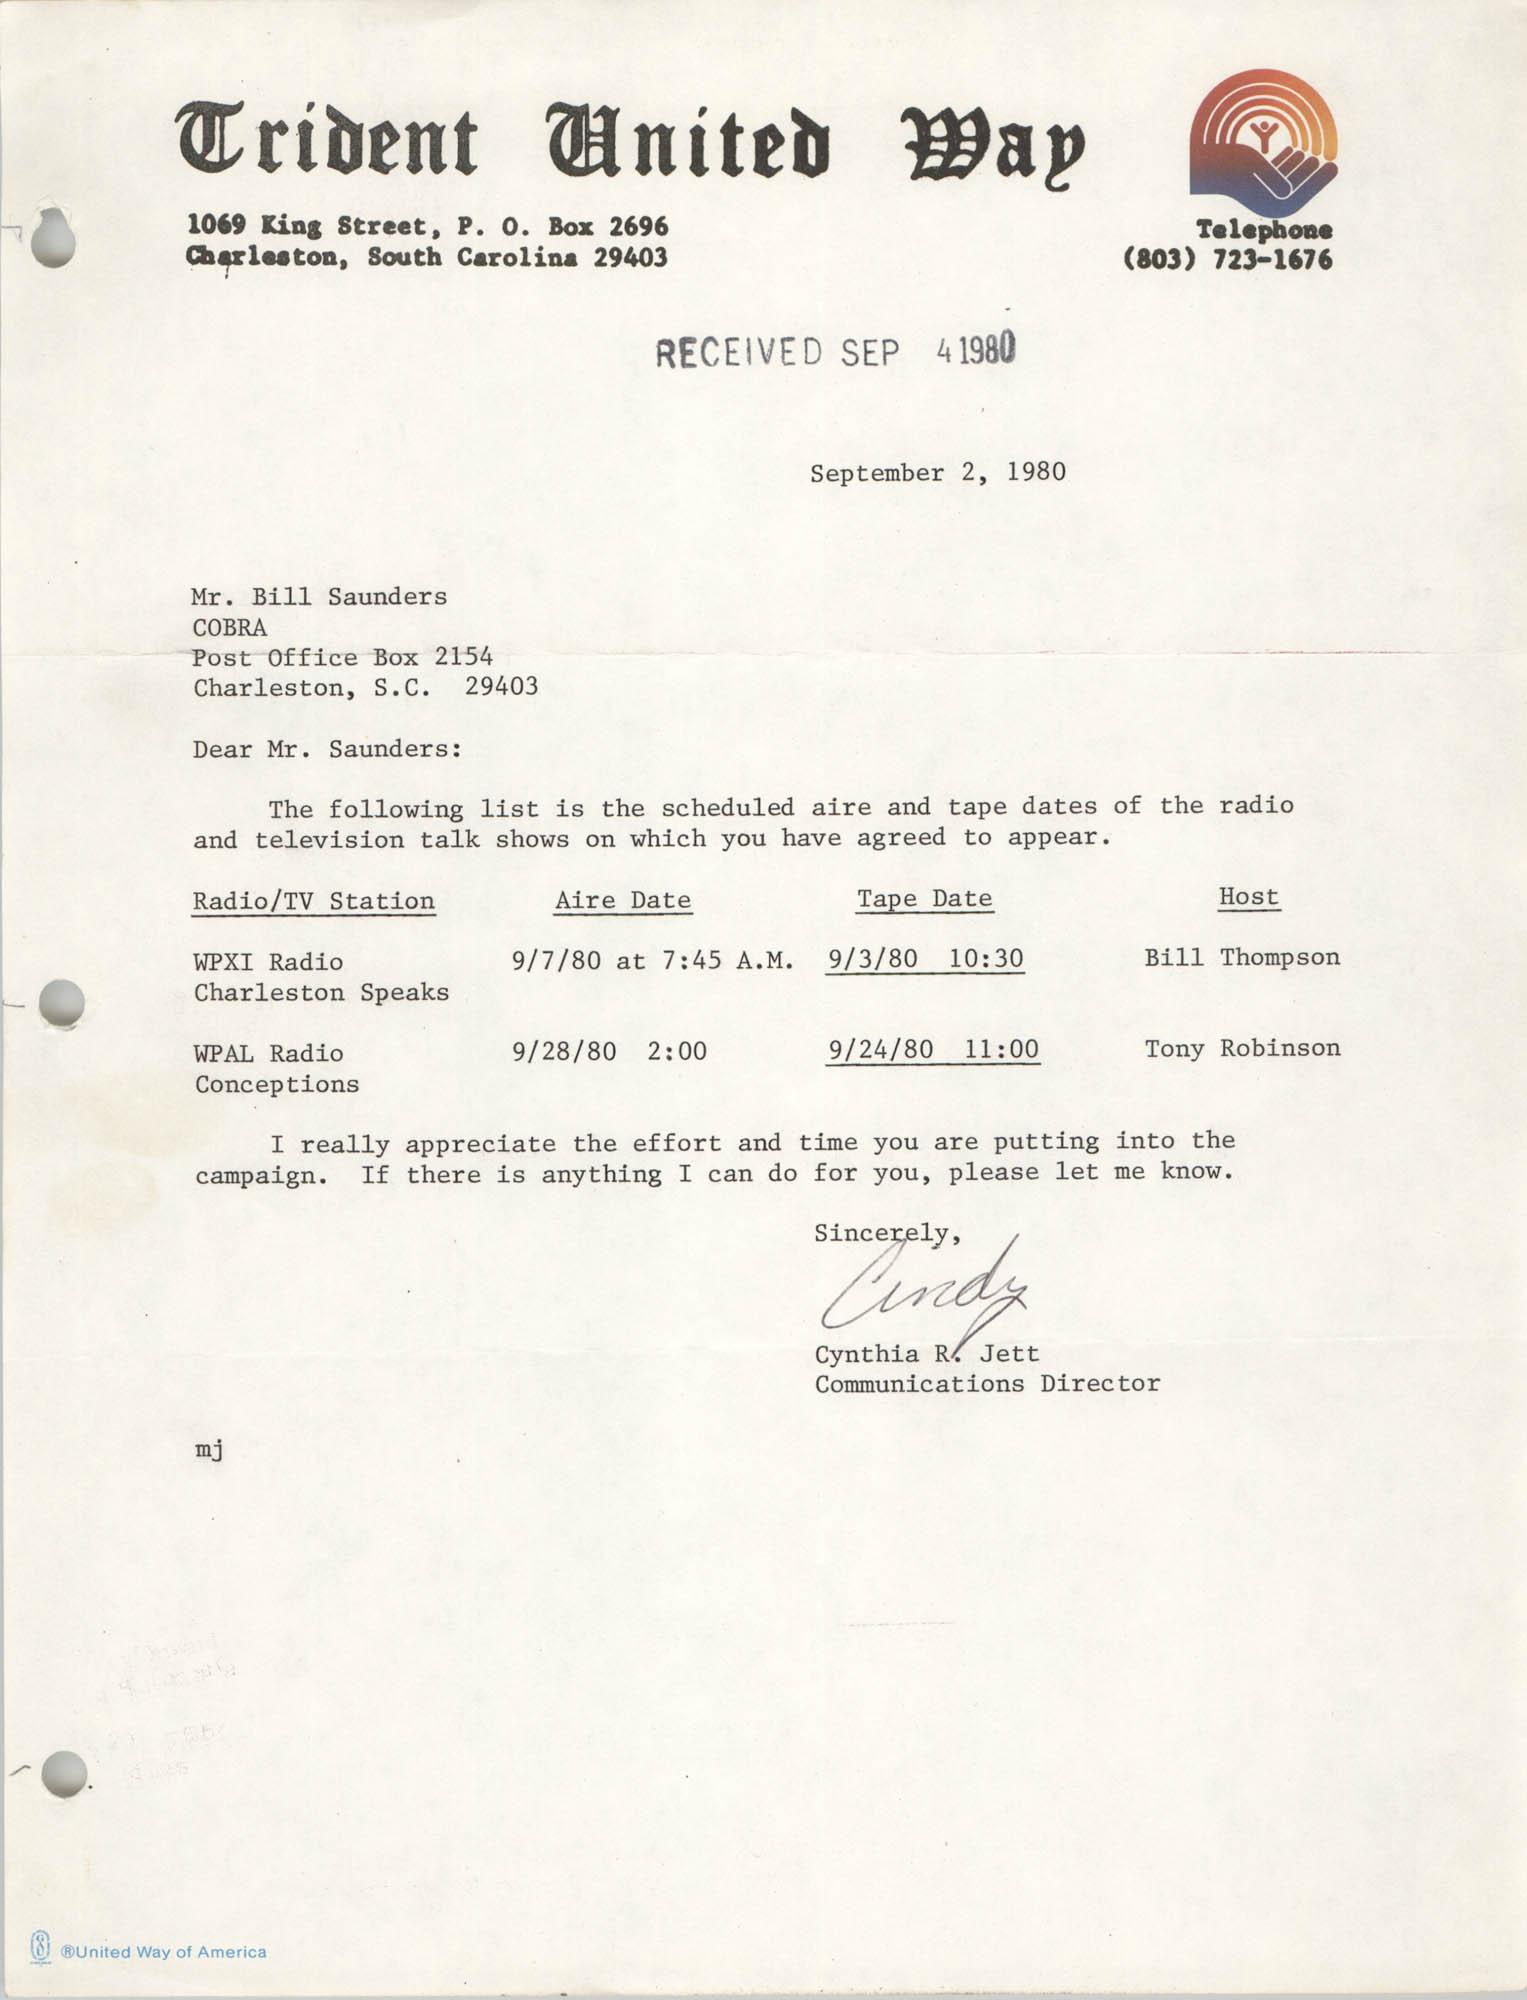 Letter from Cynthia R. Jett to Bill Saunders, September 2, 1980